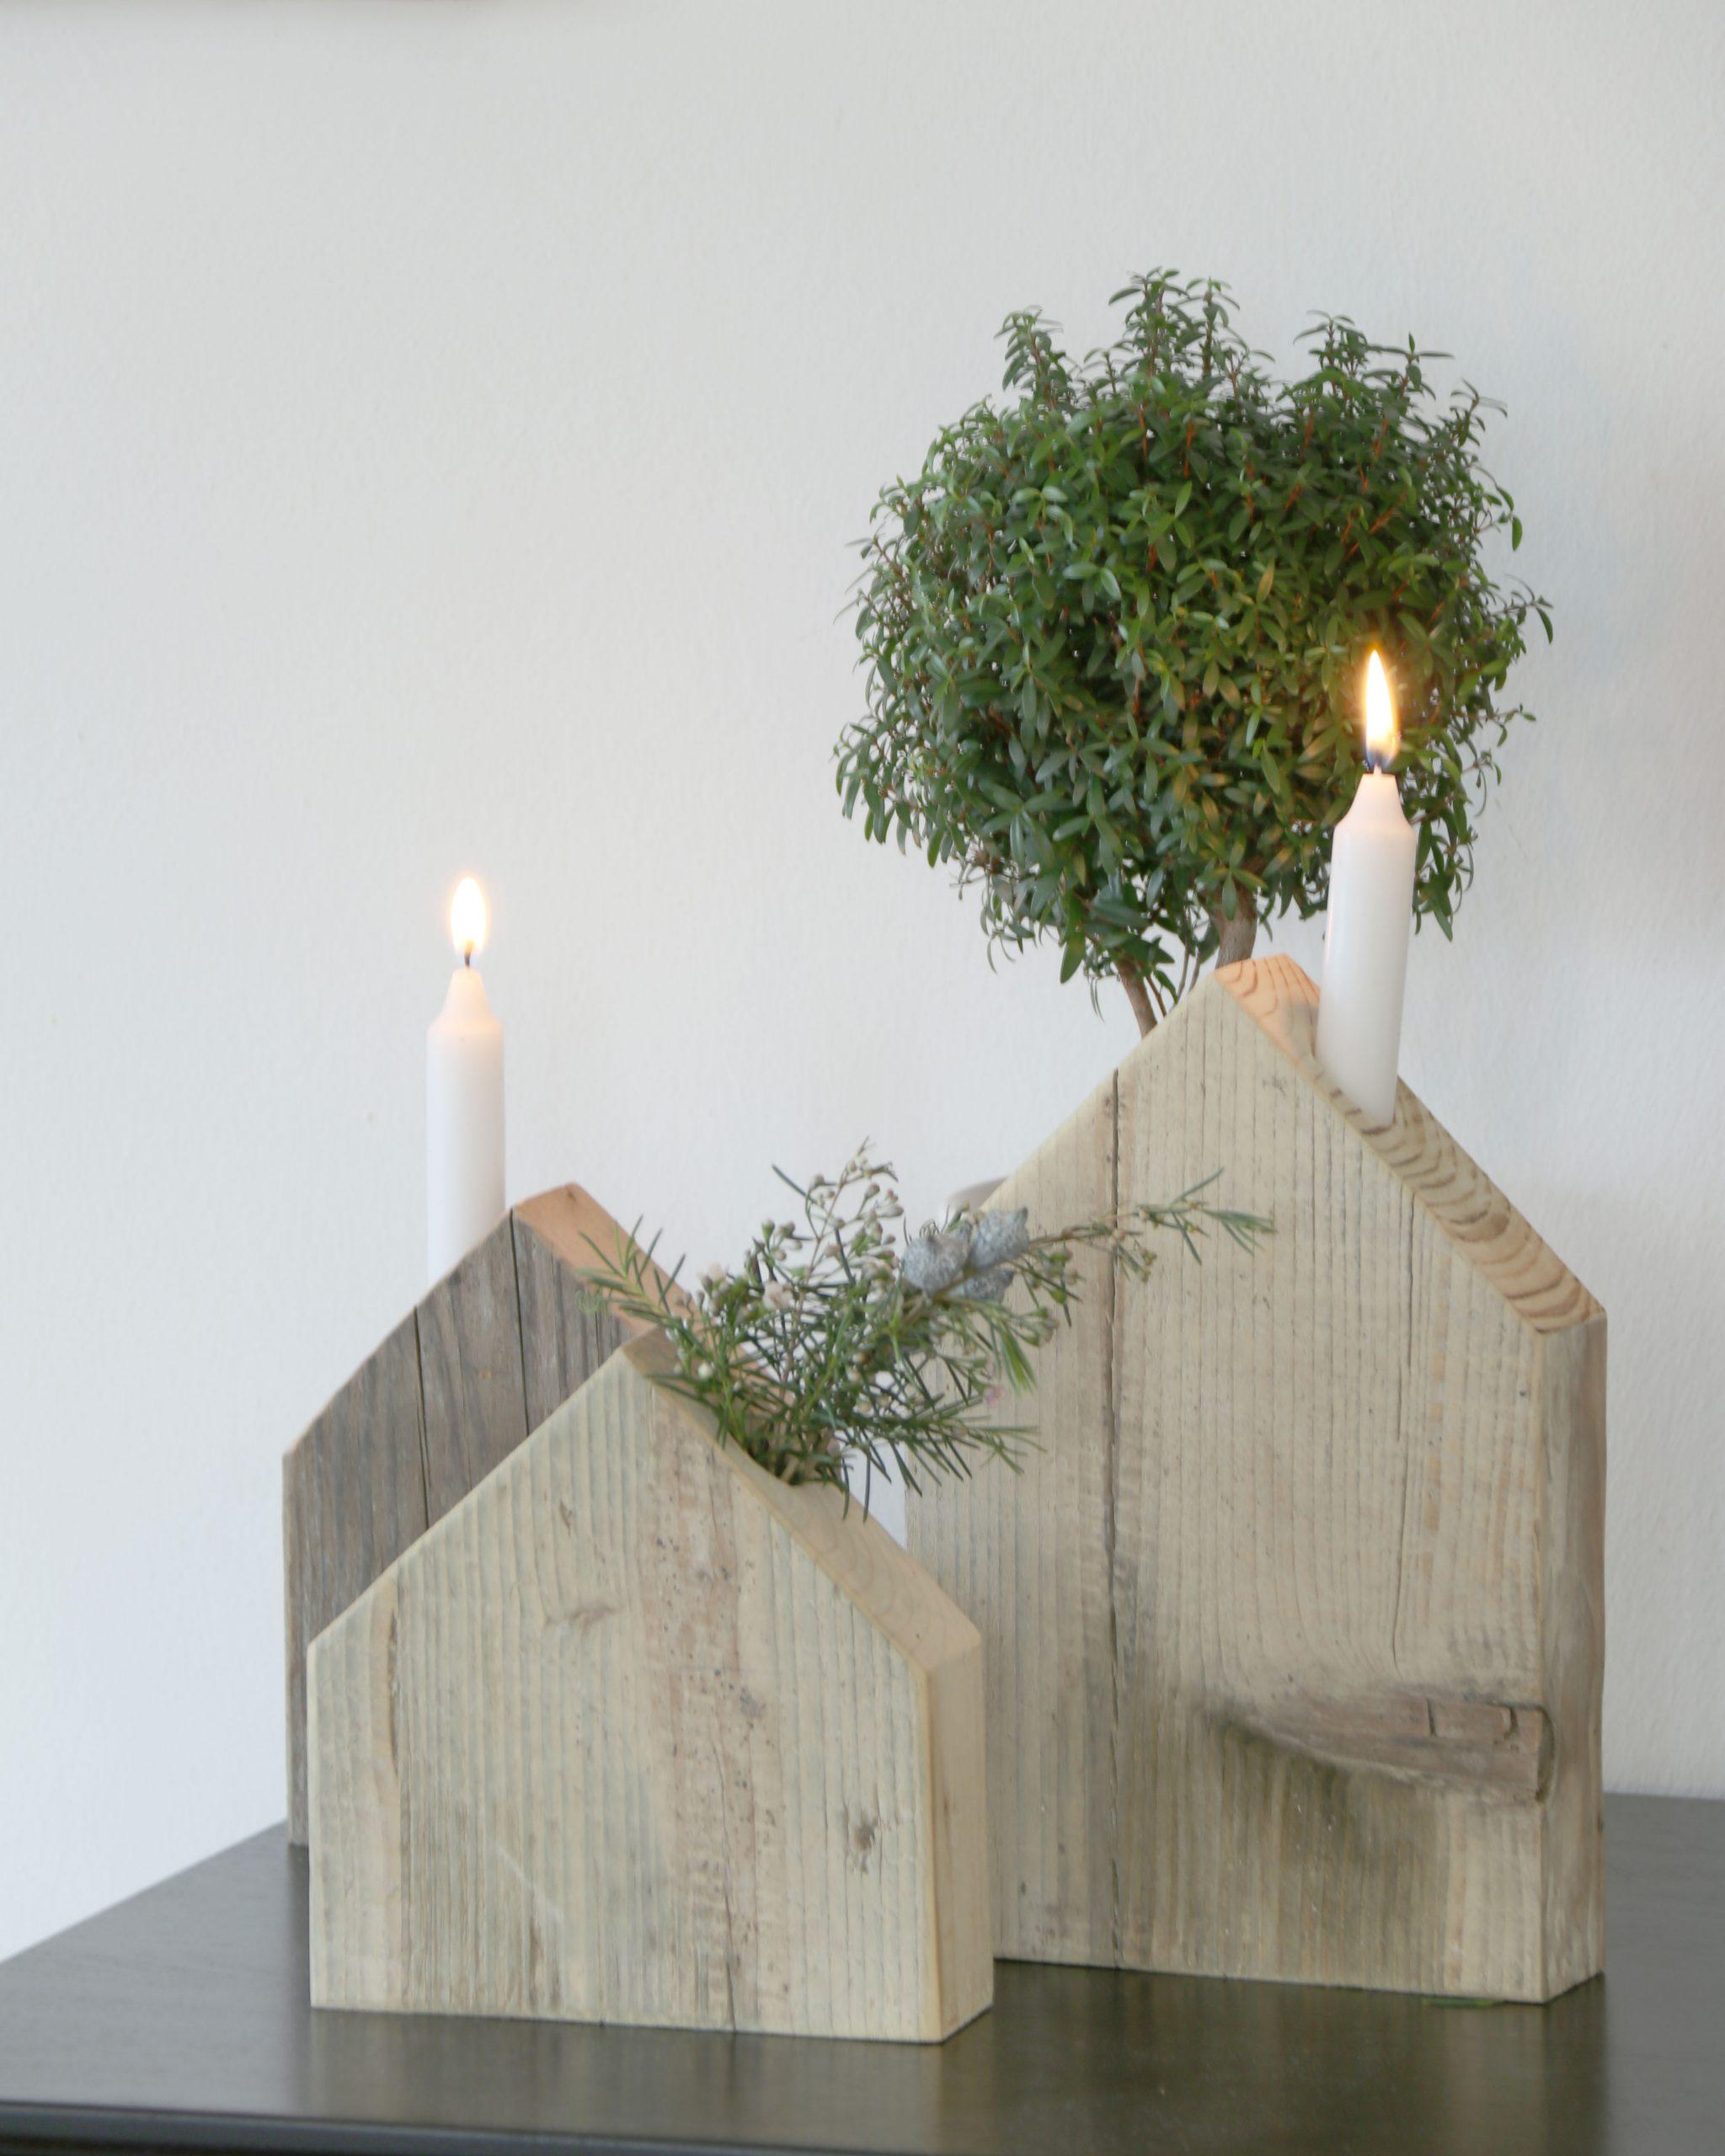 Selbstgemachte Holzhaeuschen als Altholz